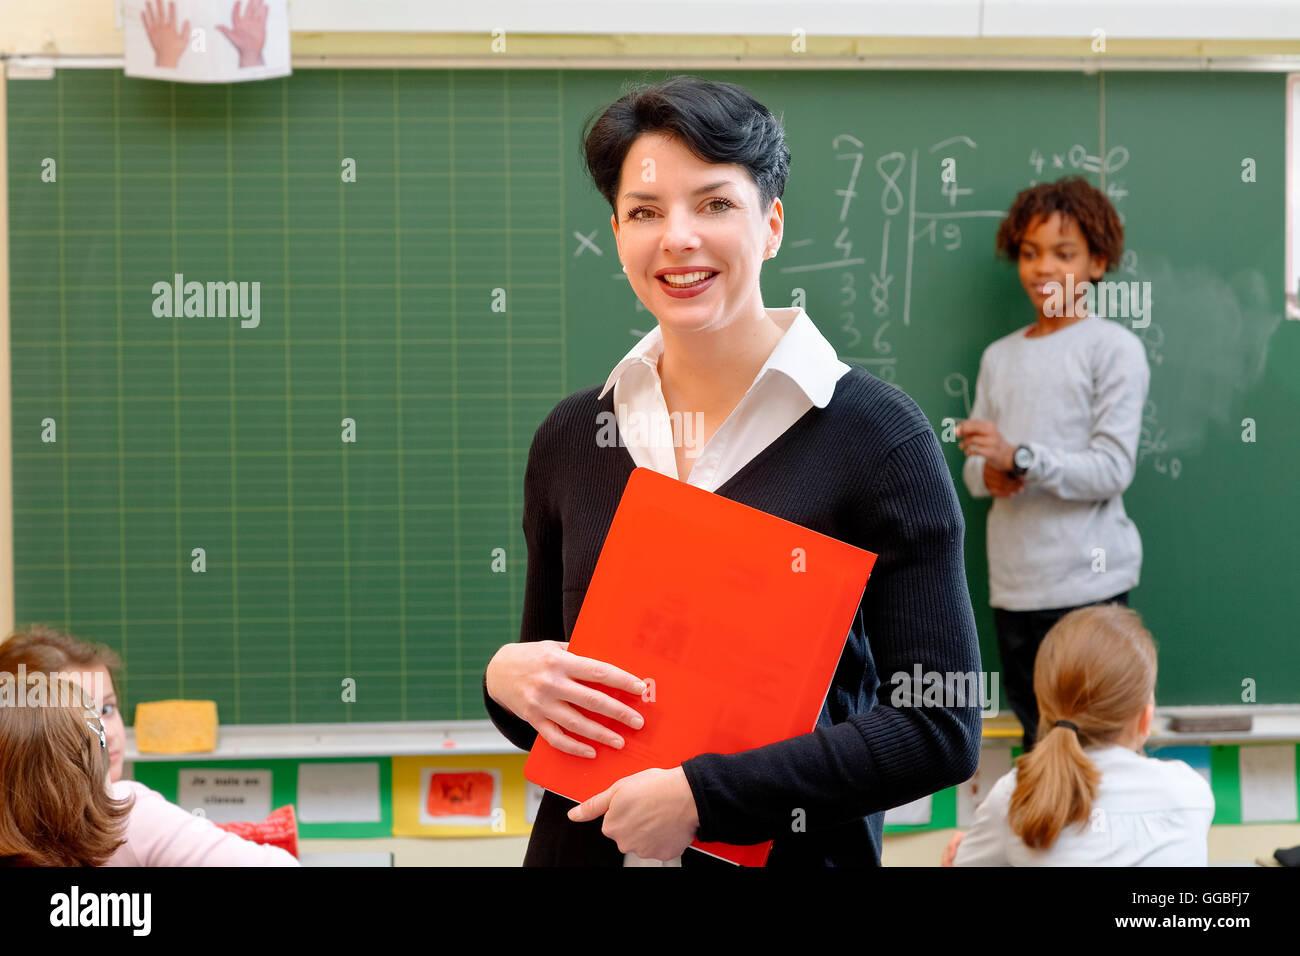 Portrait of a teacher in classroom - Stock Image